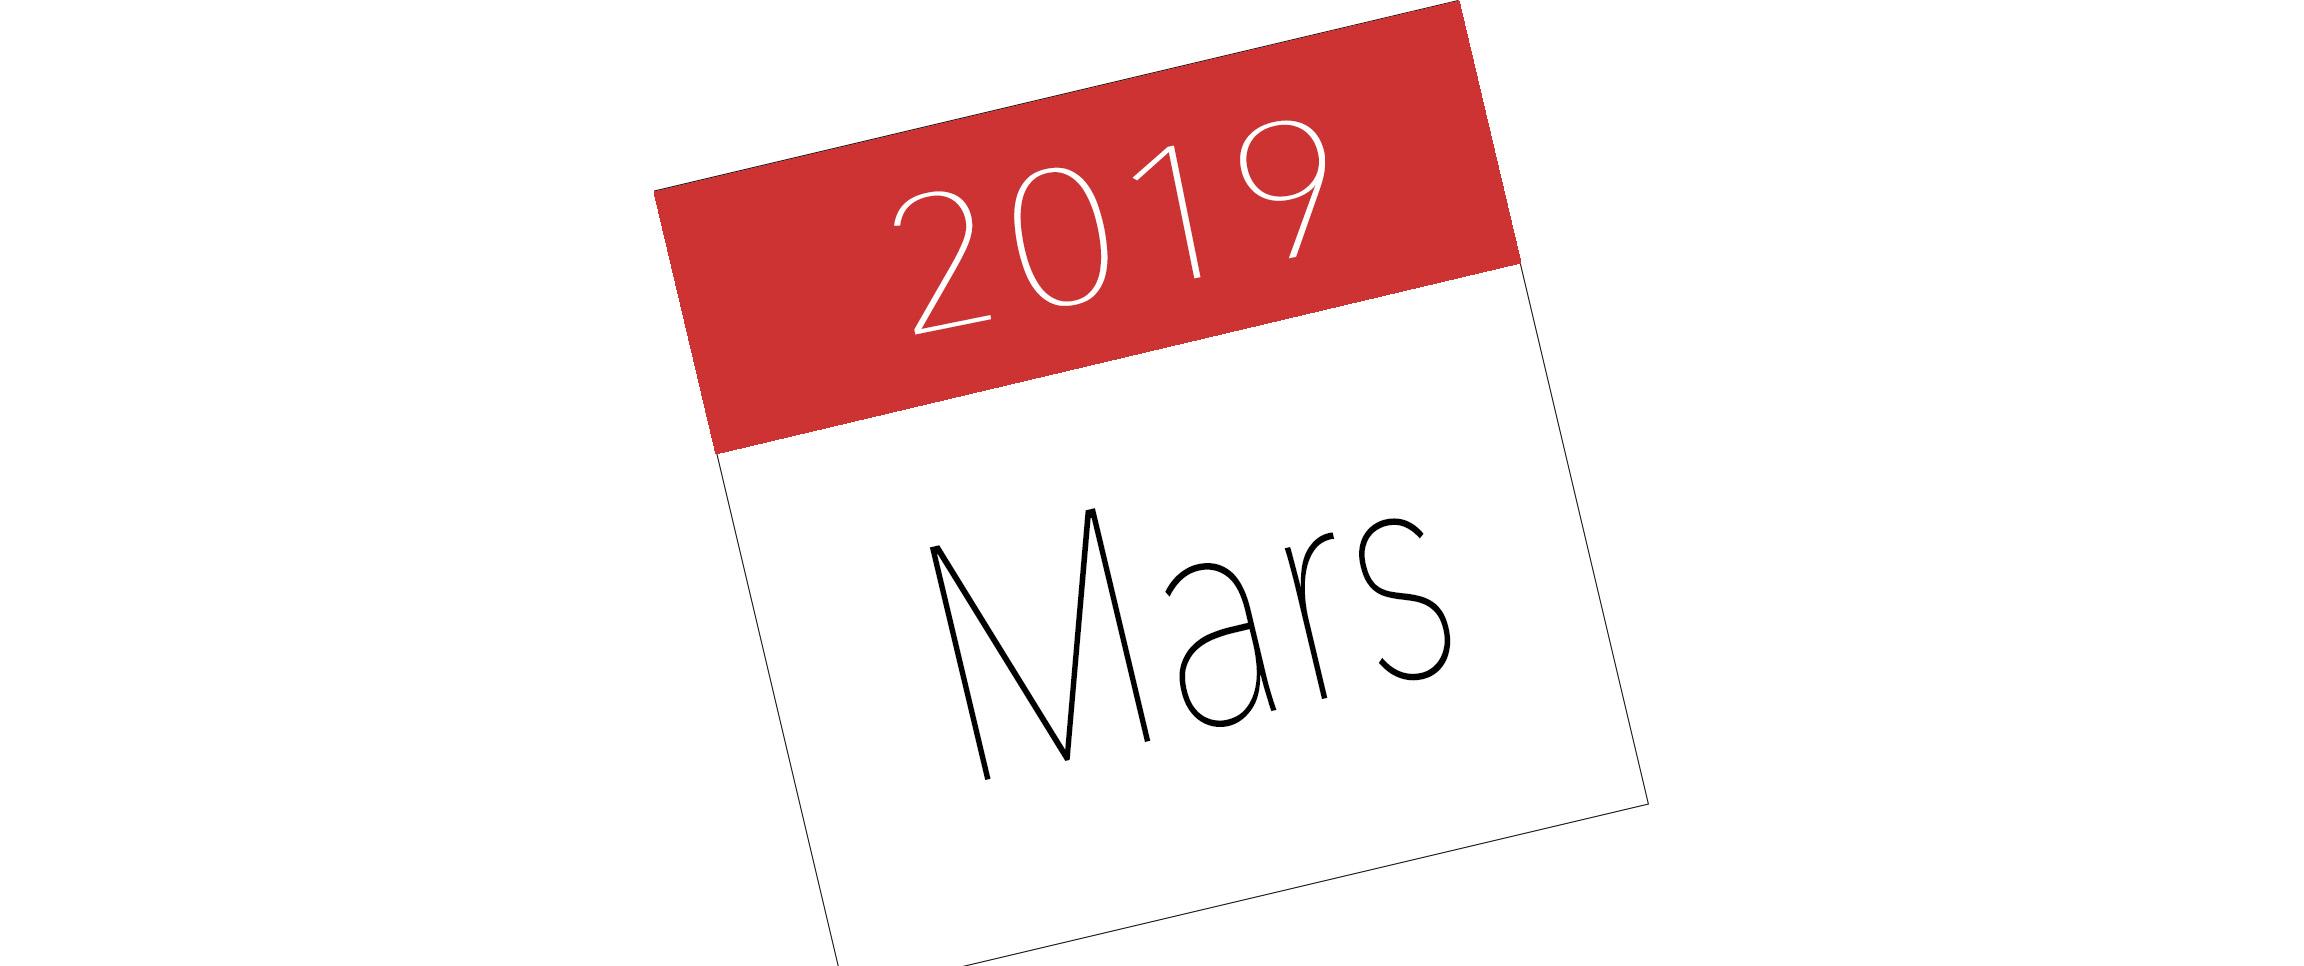 calendrier-site-mars-2019.jpg